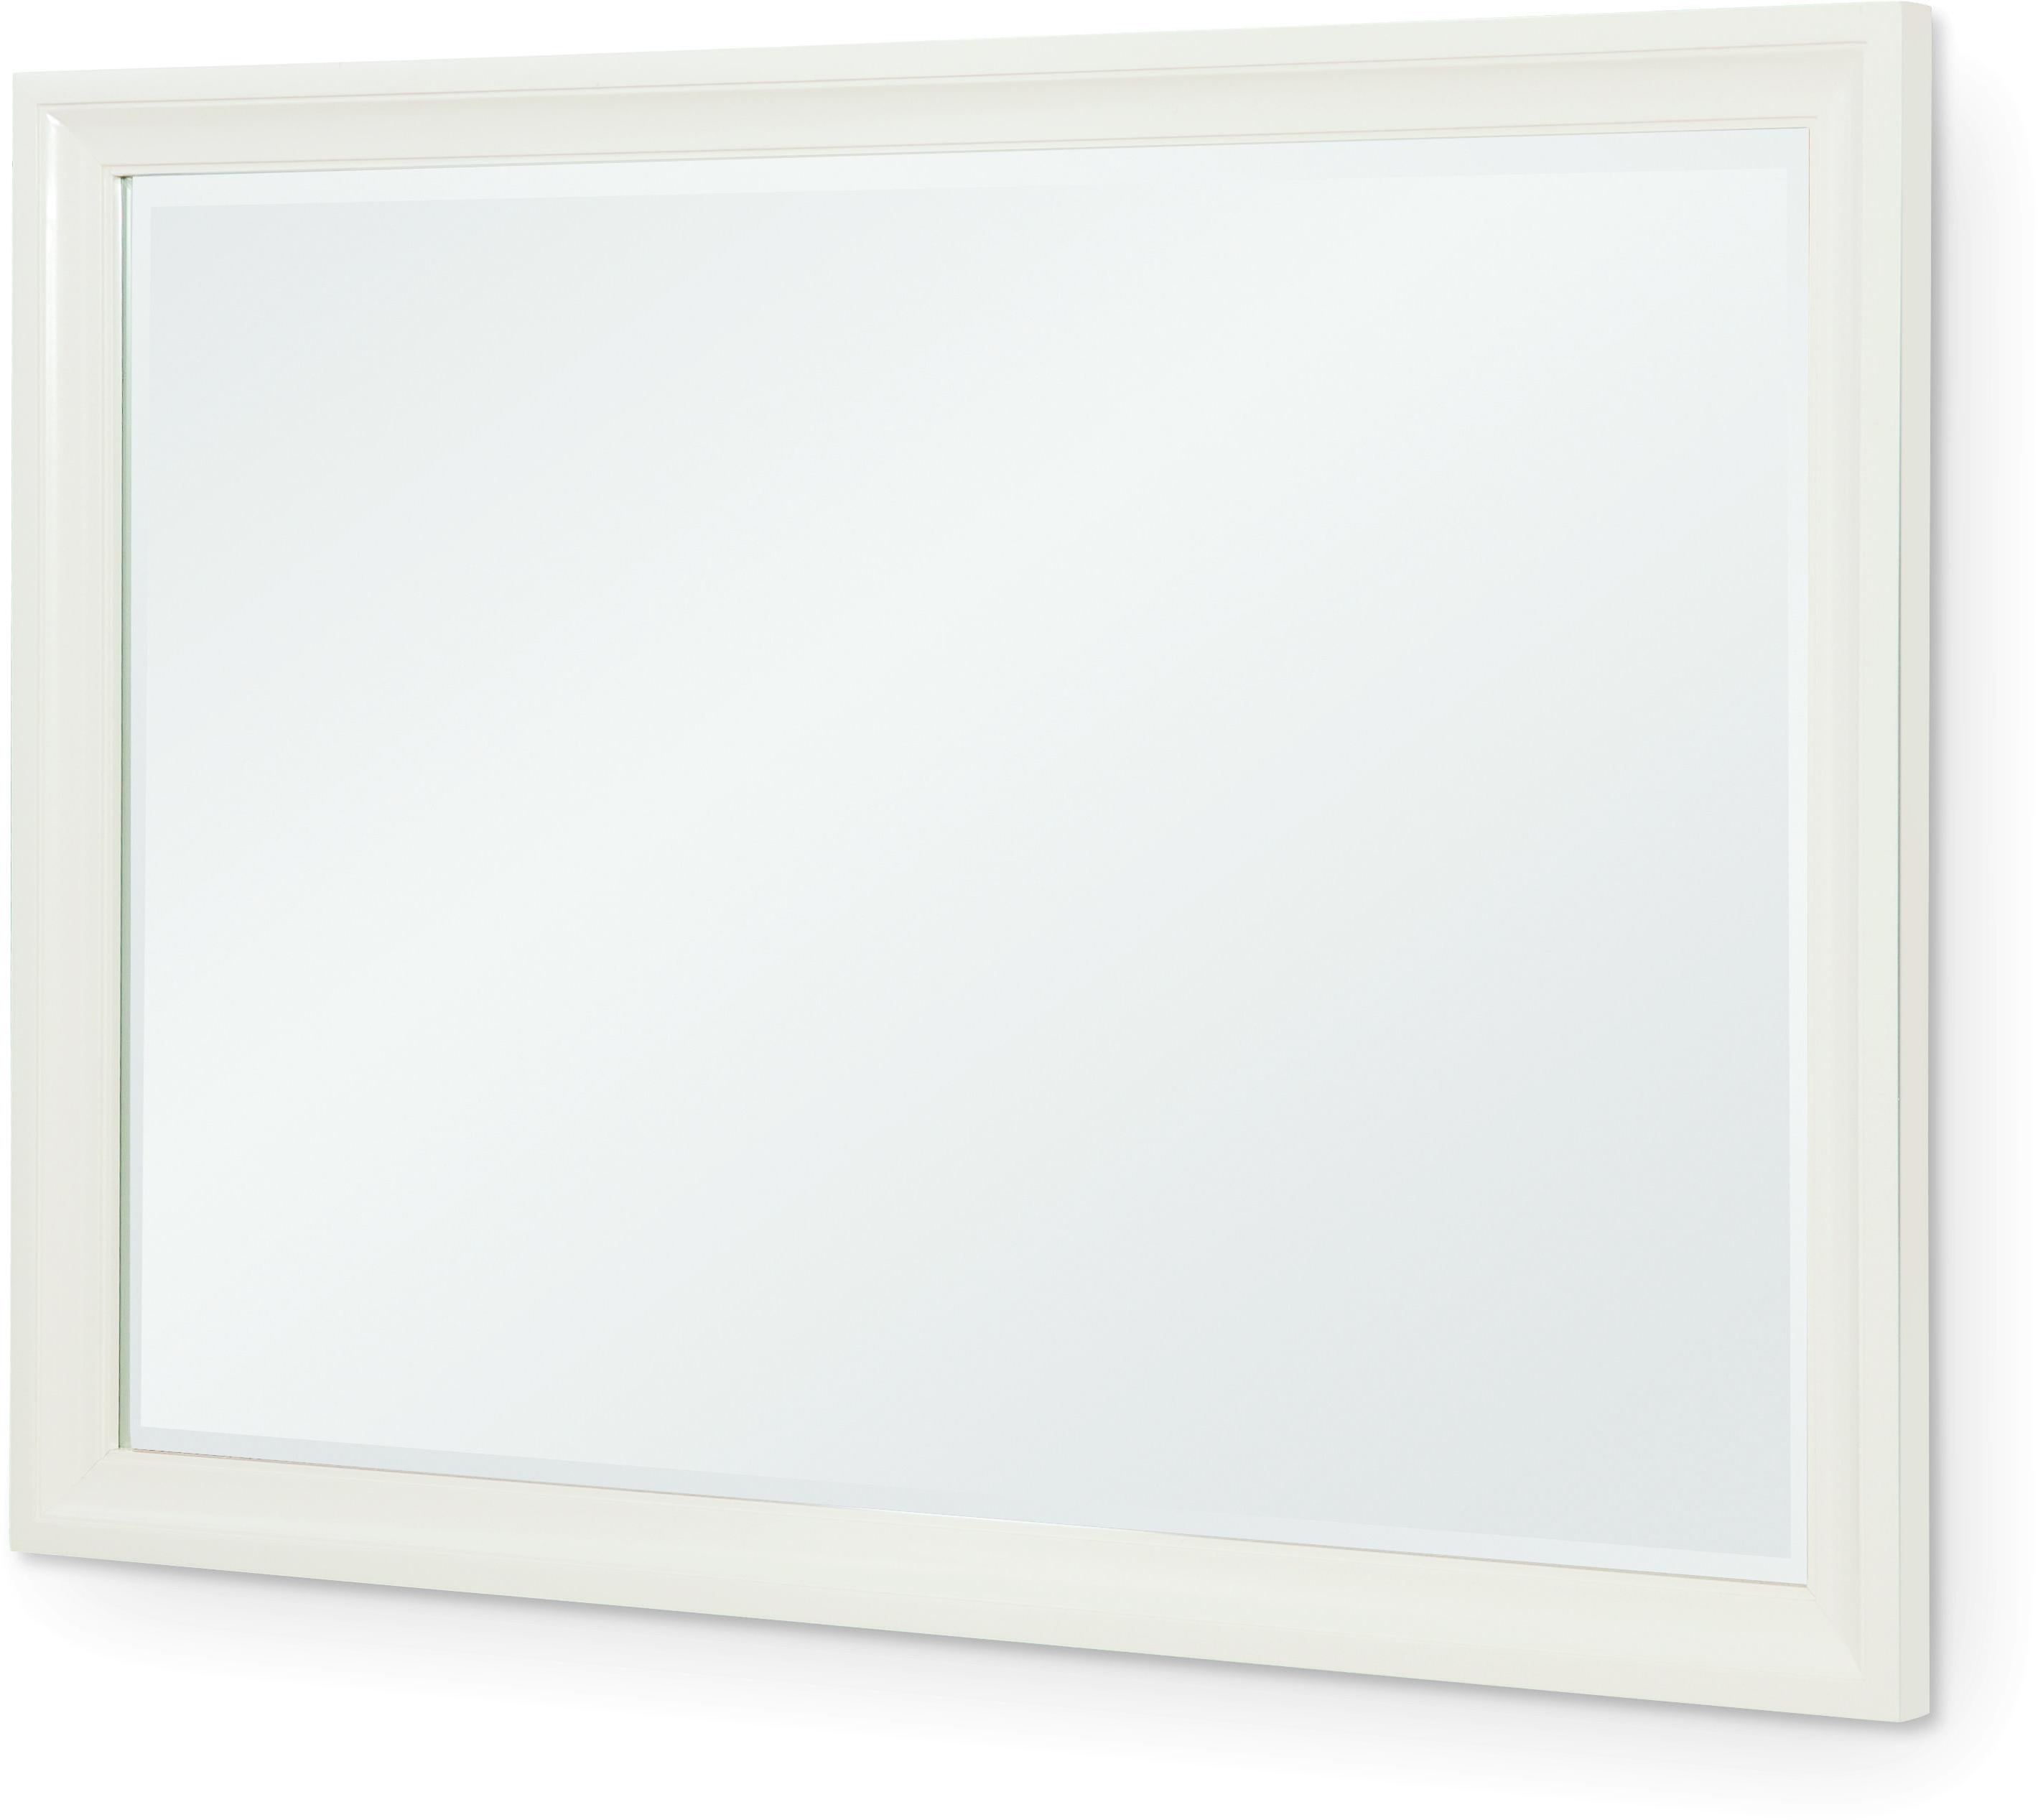 Legacy Classic Tower Suite Landscape Dresser Mirror  - Item Number: 5010-0400